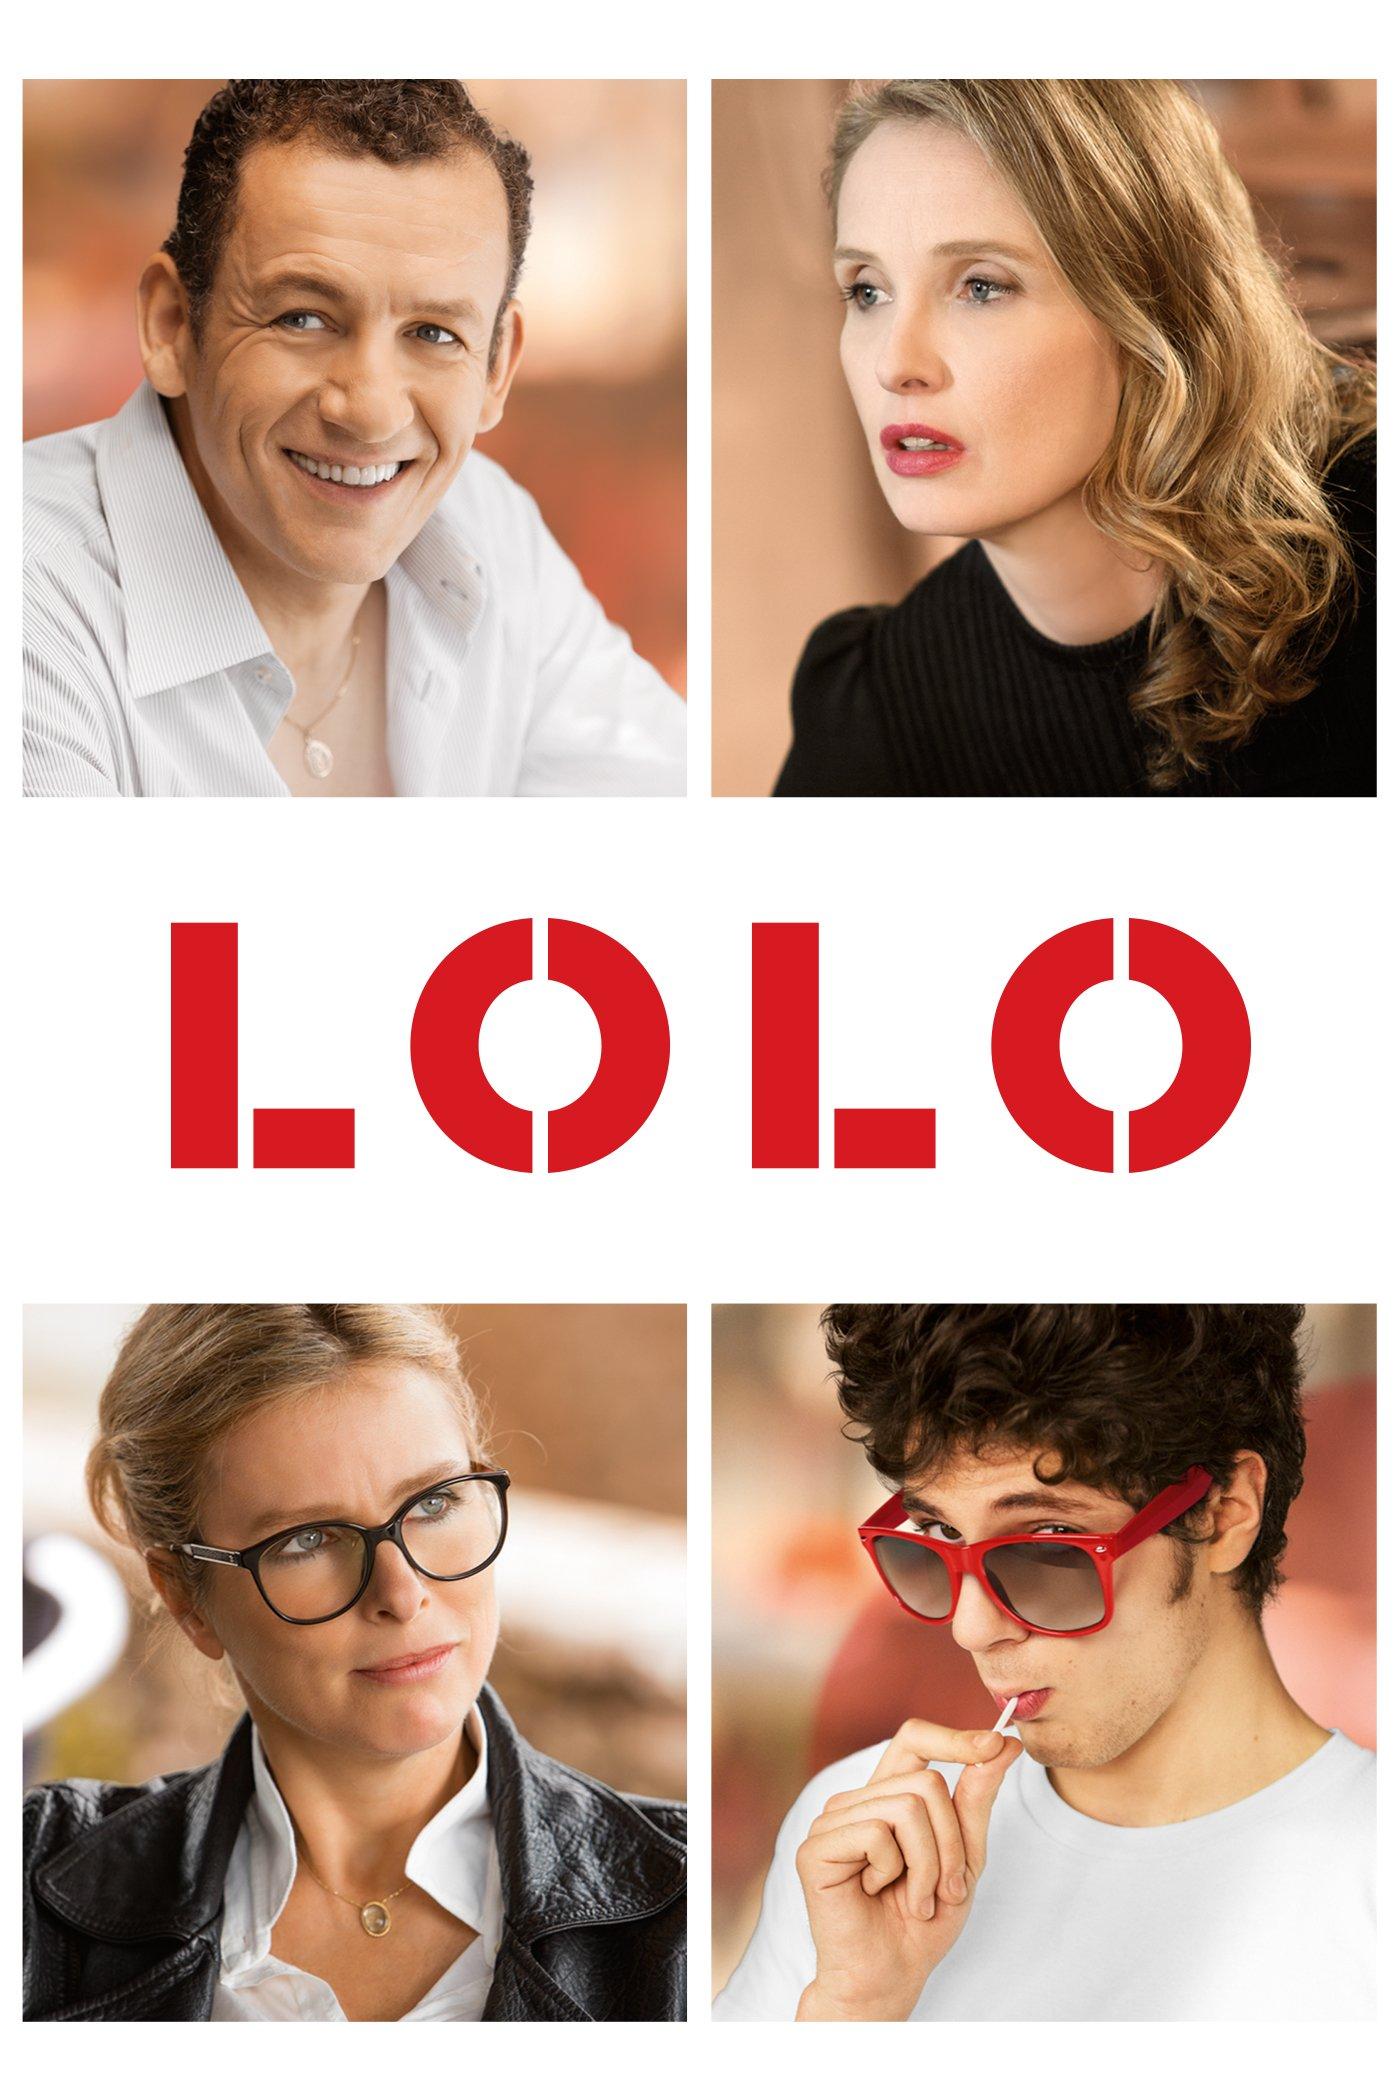 Lolo – Digital Art